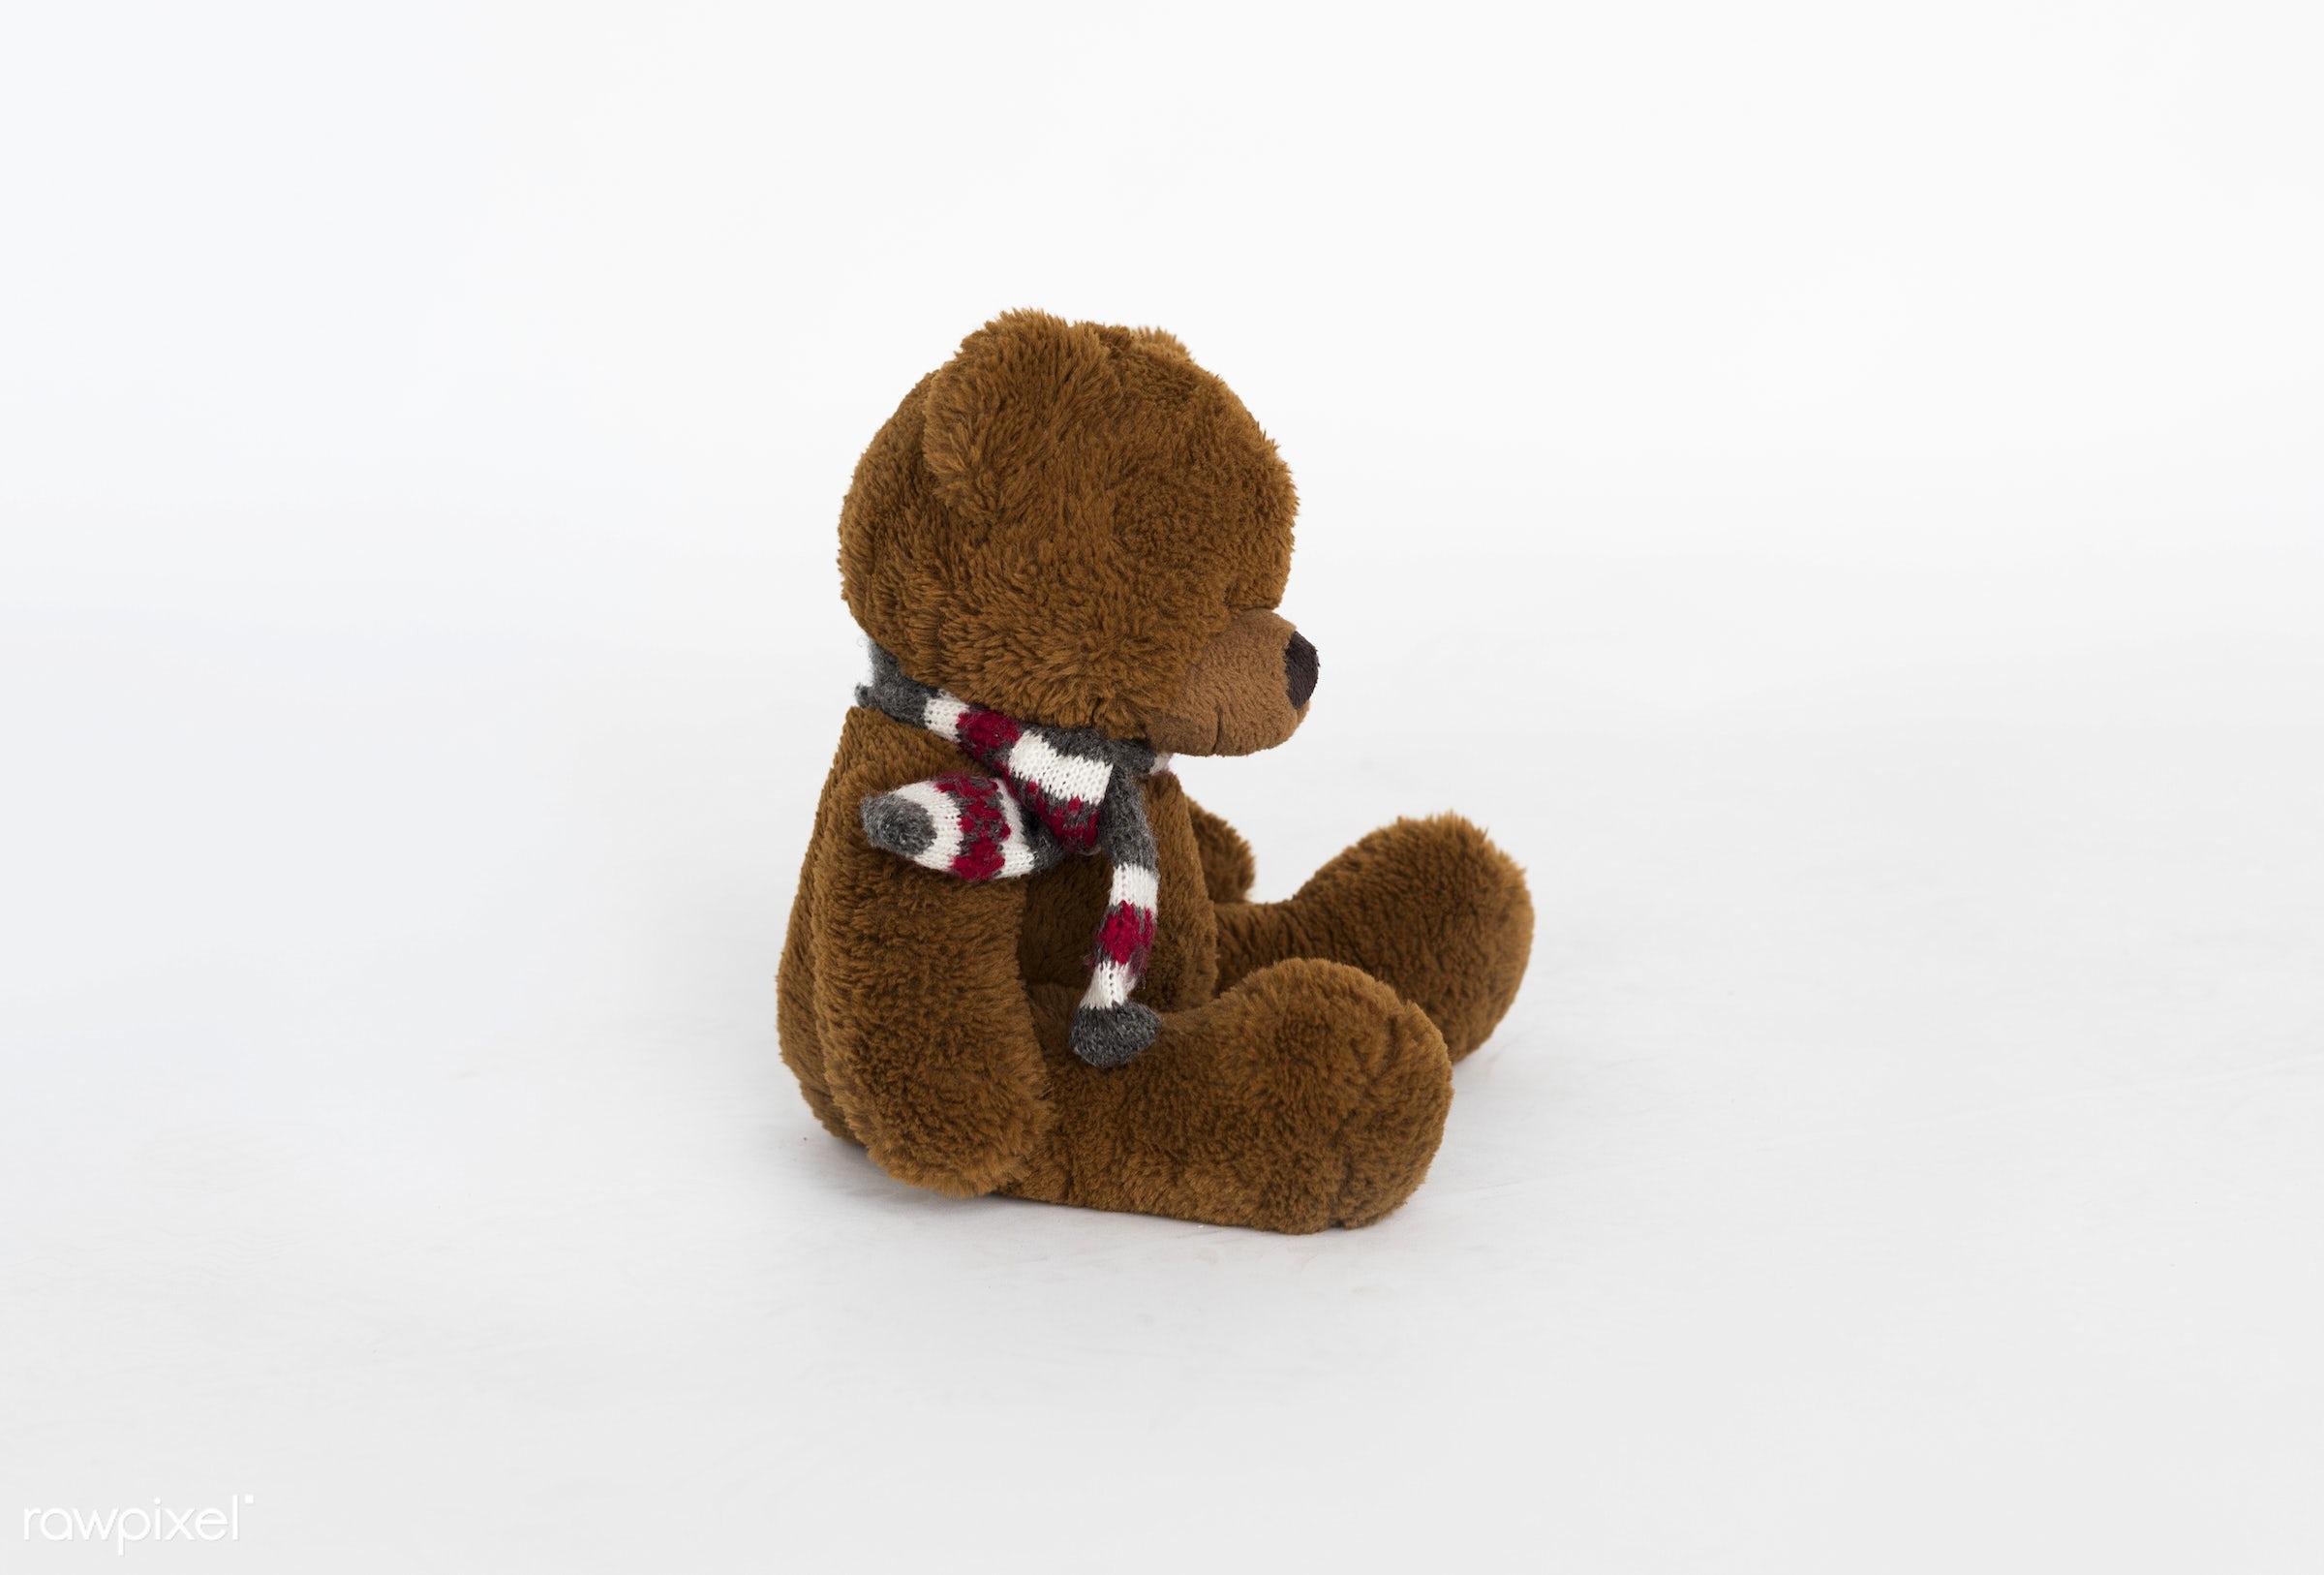 animal, background, bear, beautiful, child, childhood, classic, cute, design, doll, emotion, expression, fluffy, friendship...